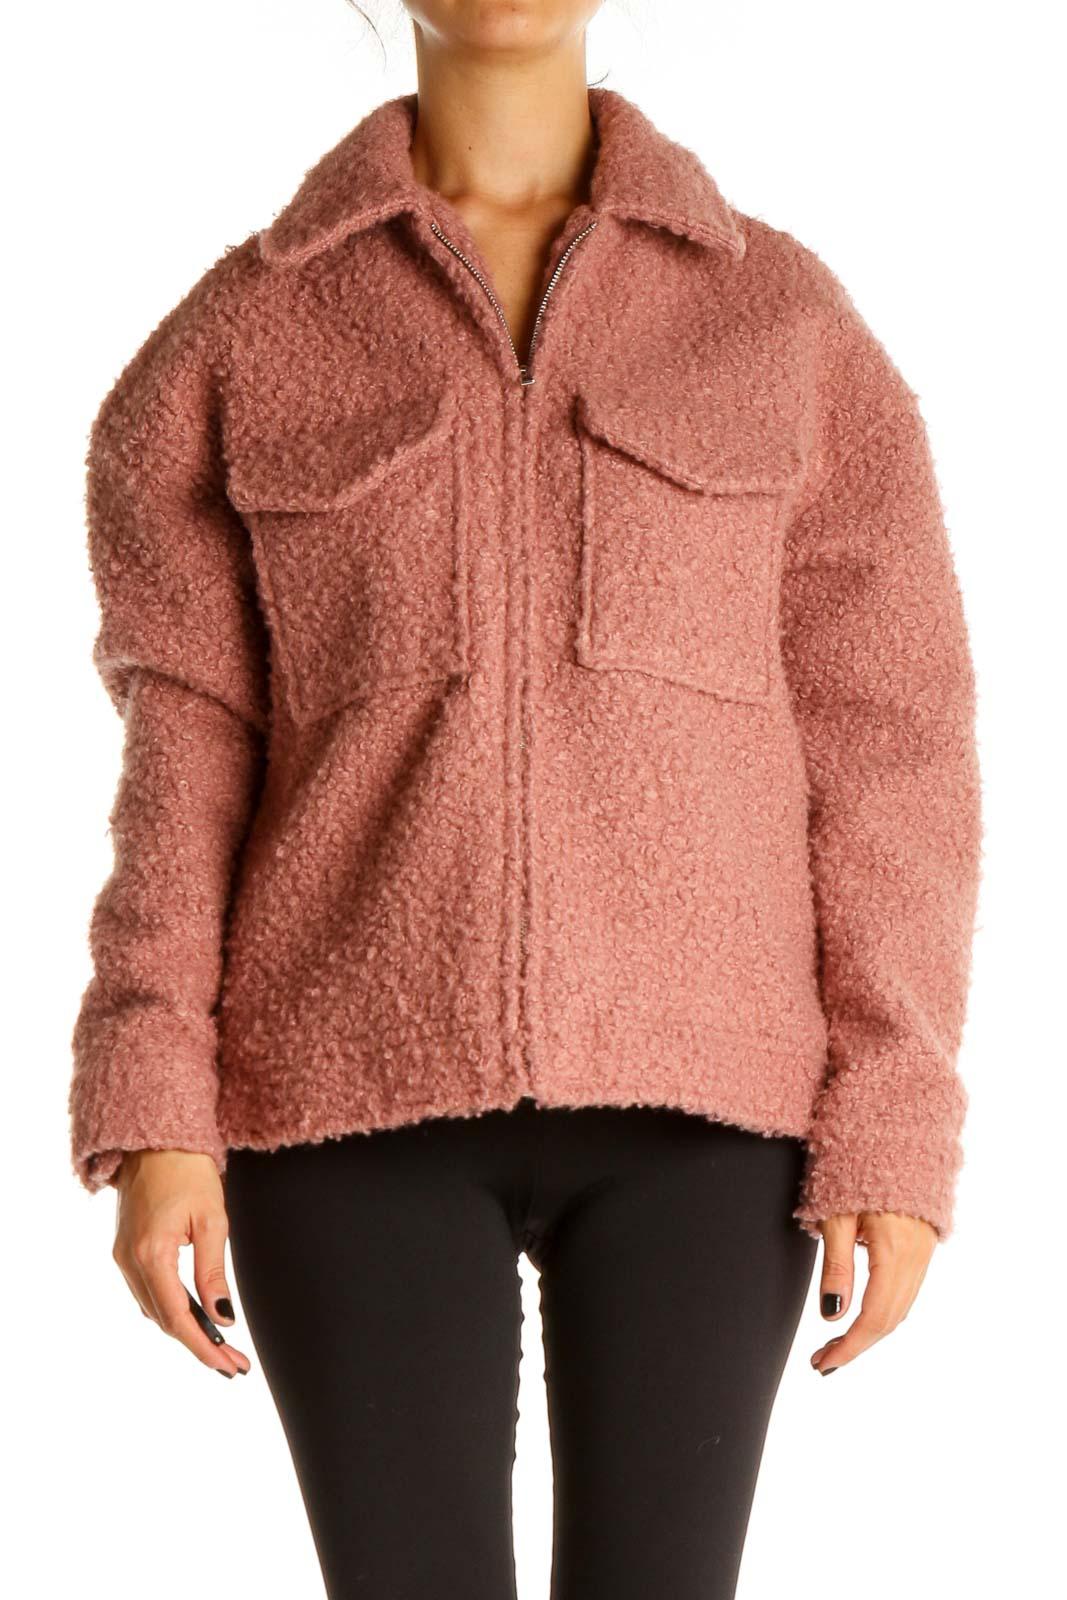 Pink Jacket Front